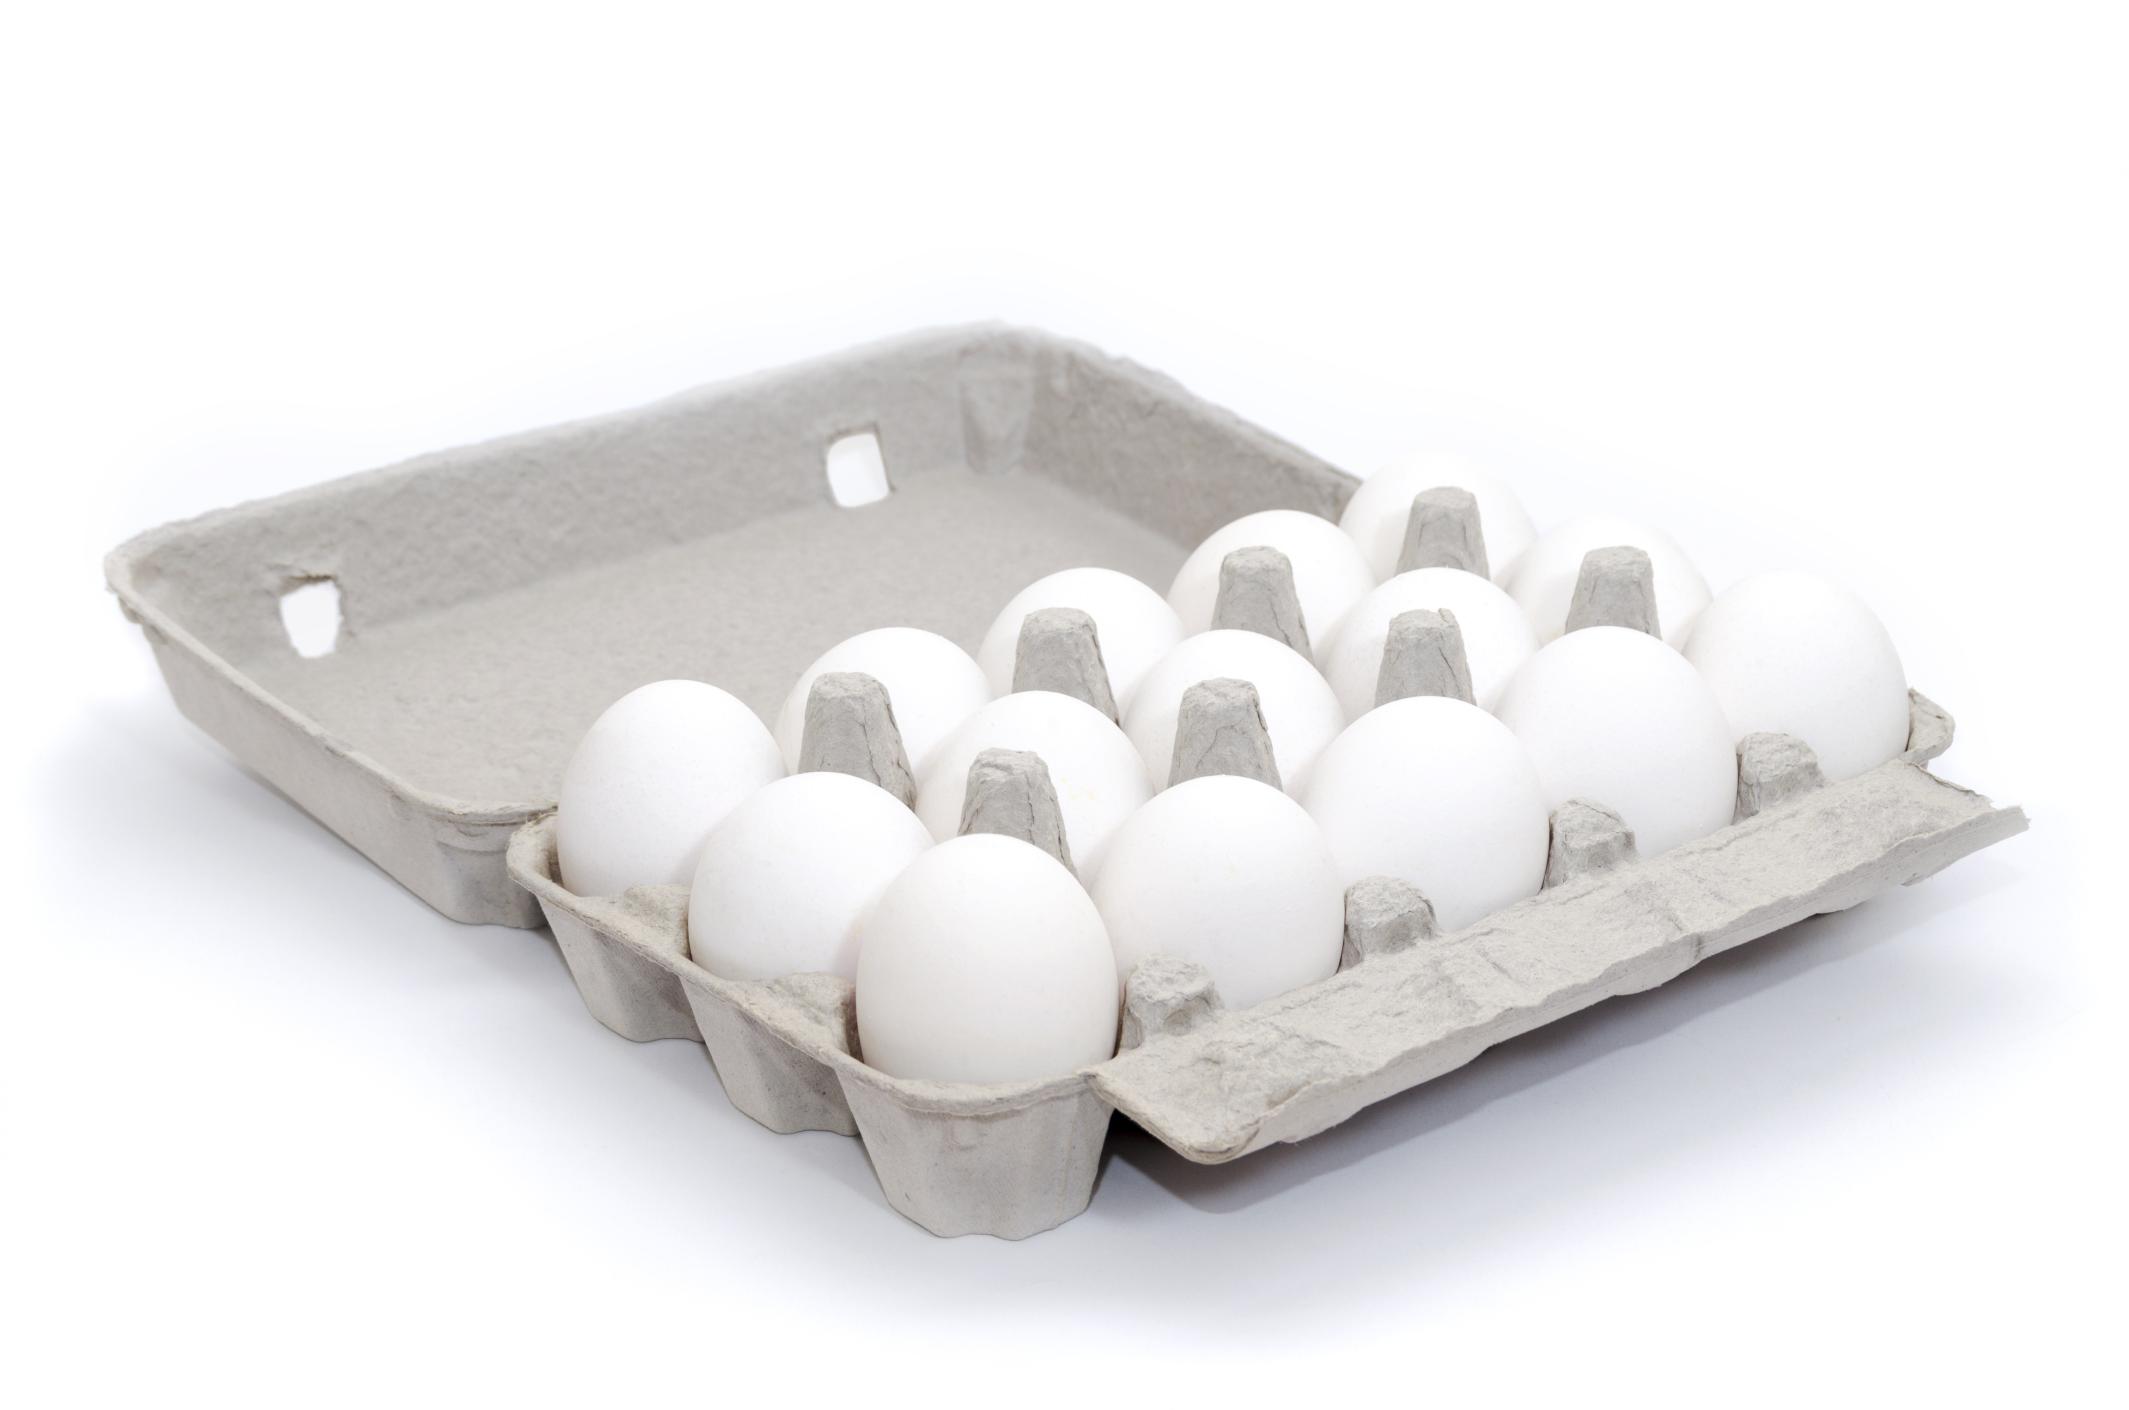 Private Label Shell Eggs